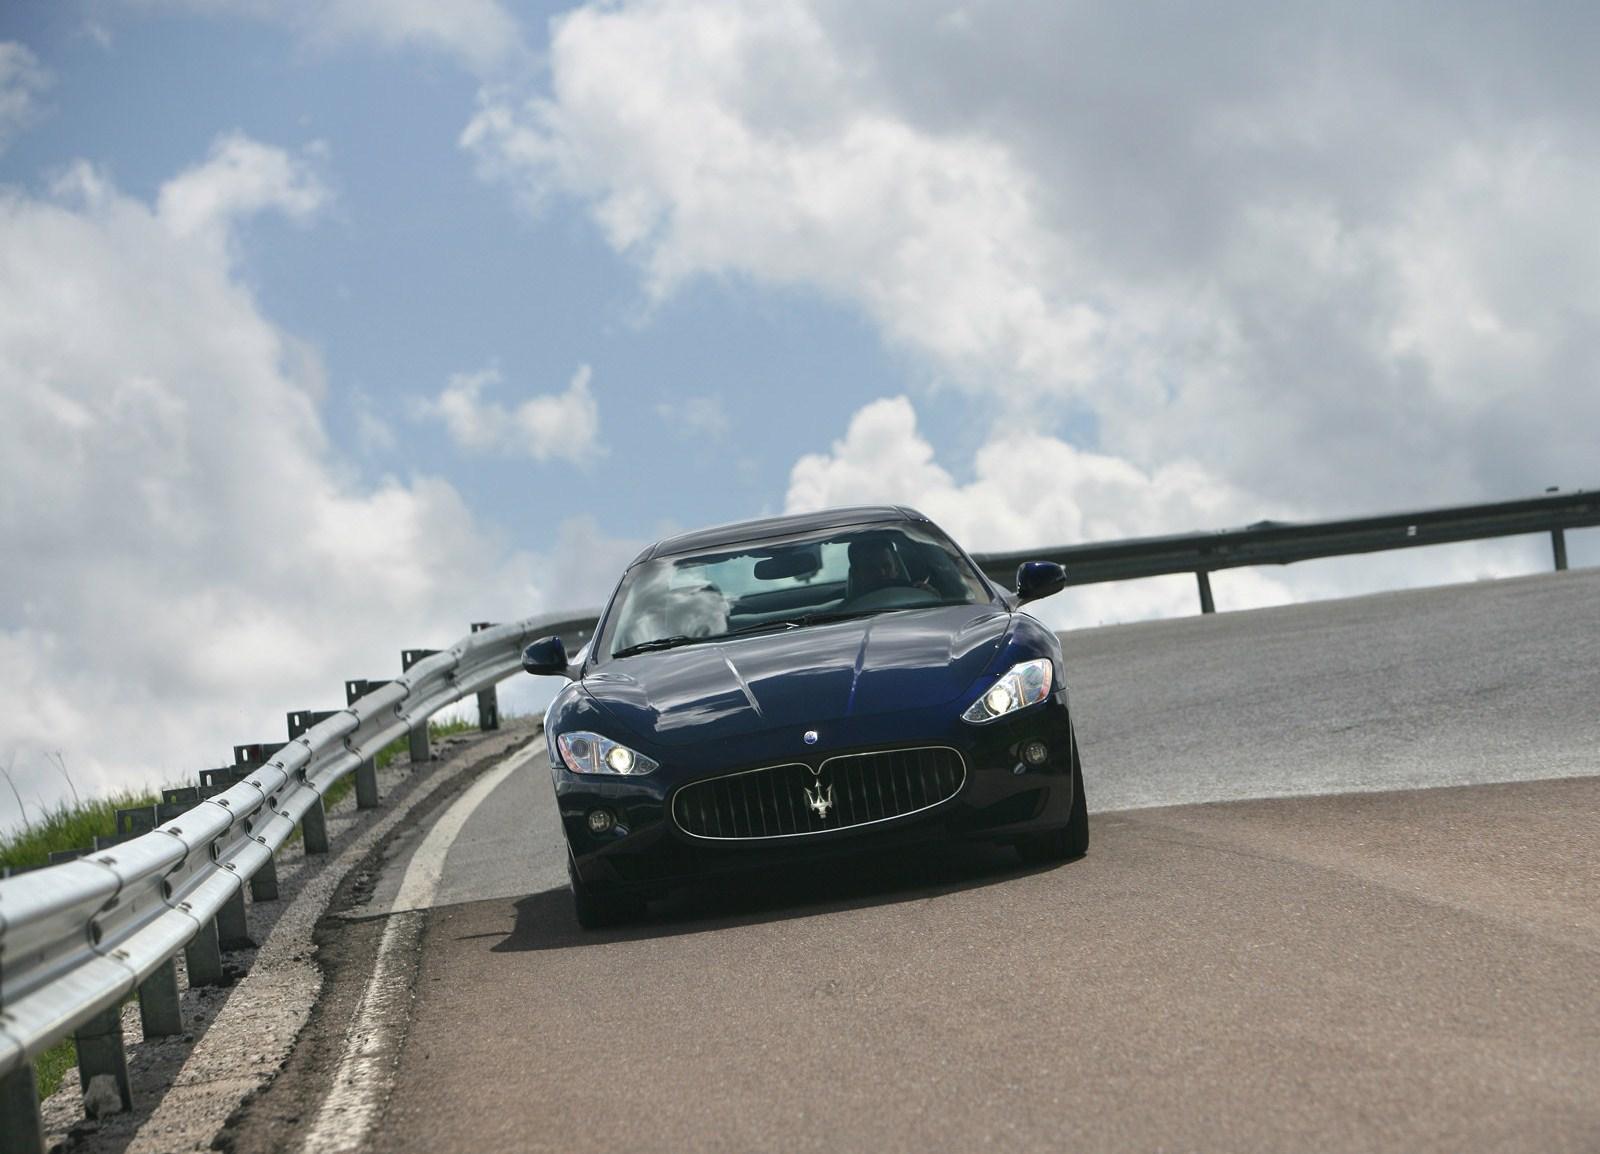 http://3.bp.blogspot.com/_sRGU_JXOz6E/TR30MO72p8I/AAAAAAAAA6Y/NFiXOUcU_TA/s1600/Maserati-GranTurismo_2008_1600x1200_wallpaper_17%255B1%255D.jpg